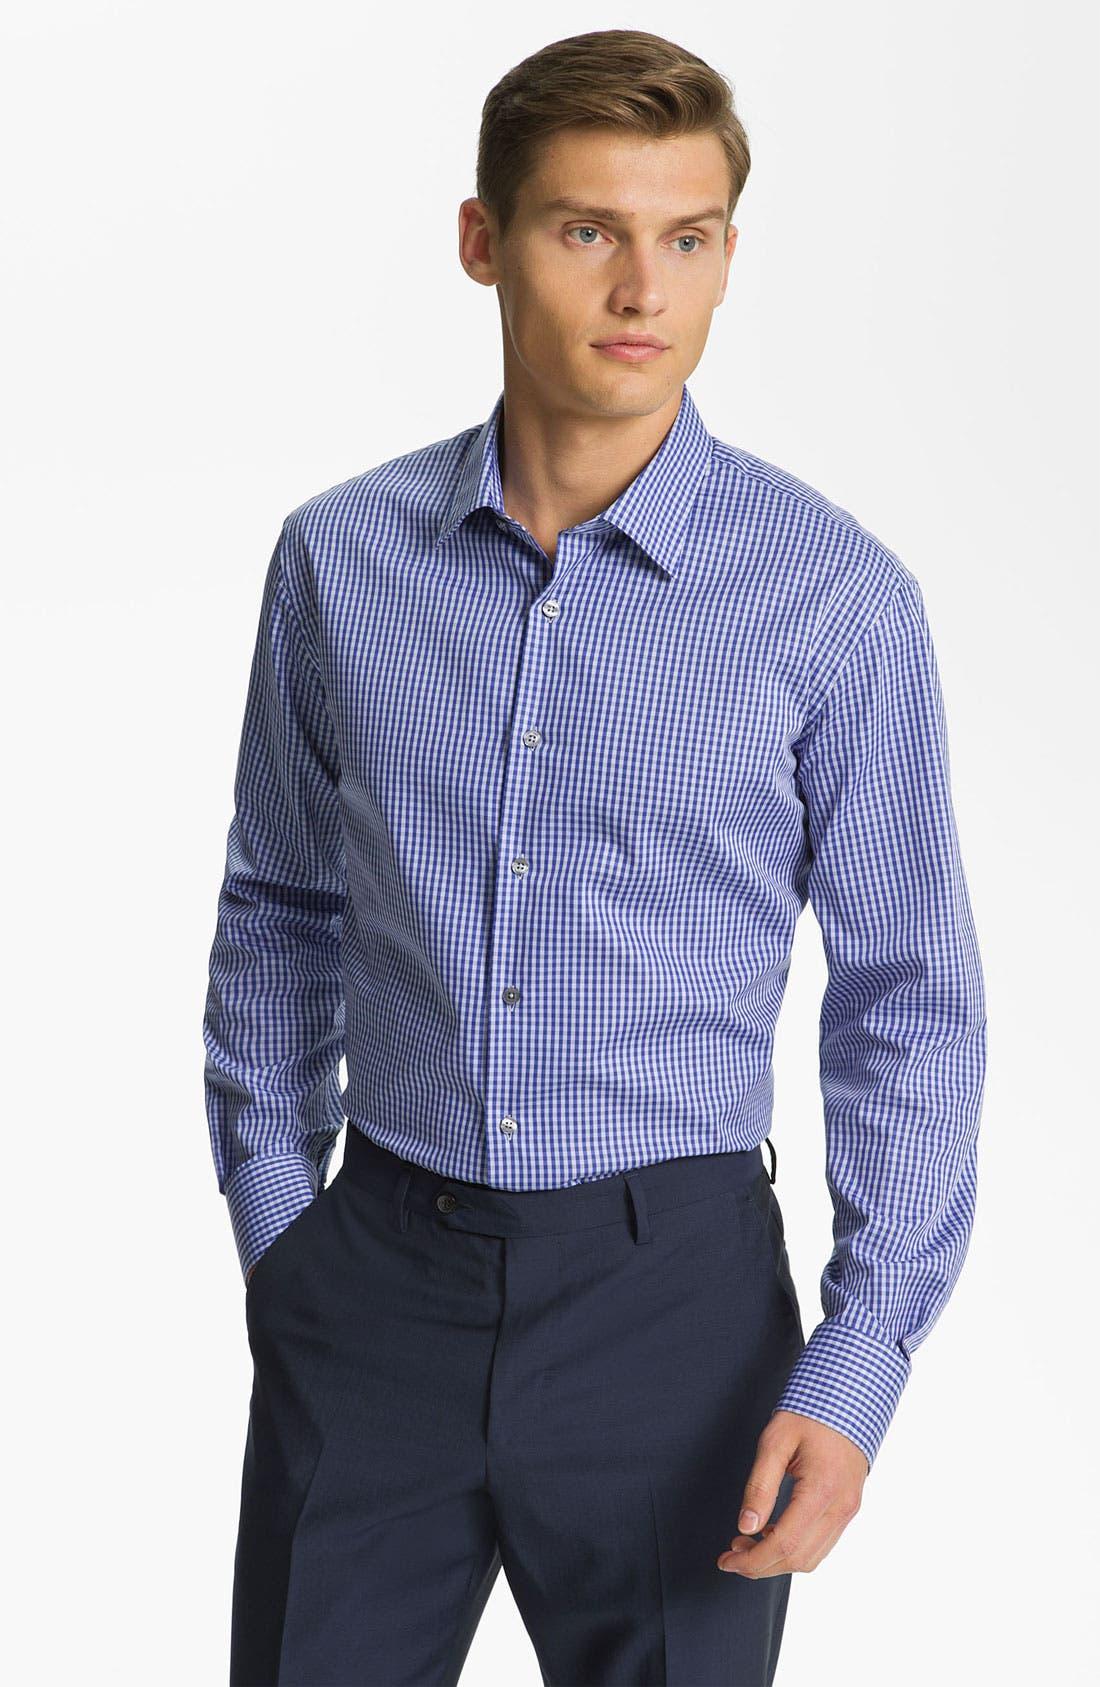 Main Image - Paul Smith London Gingham Check Dress Shirt